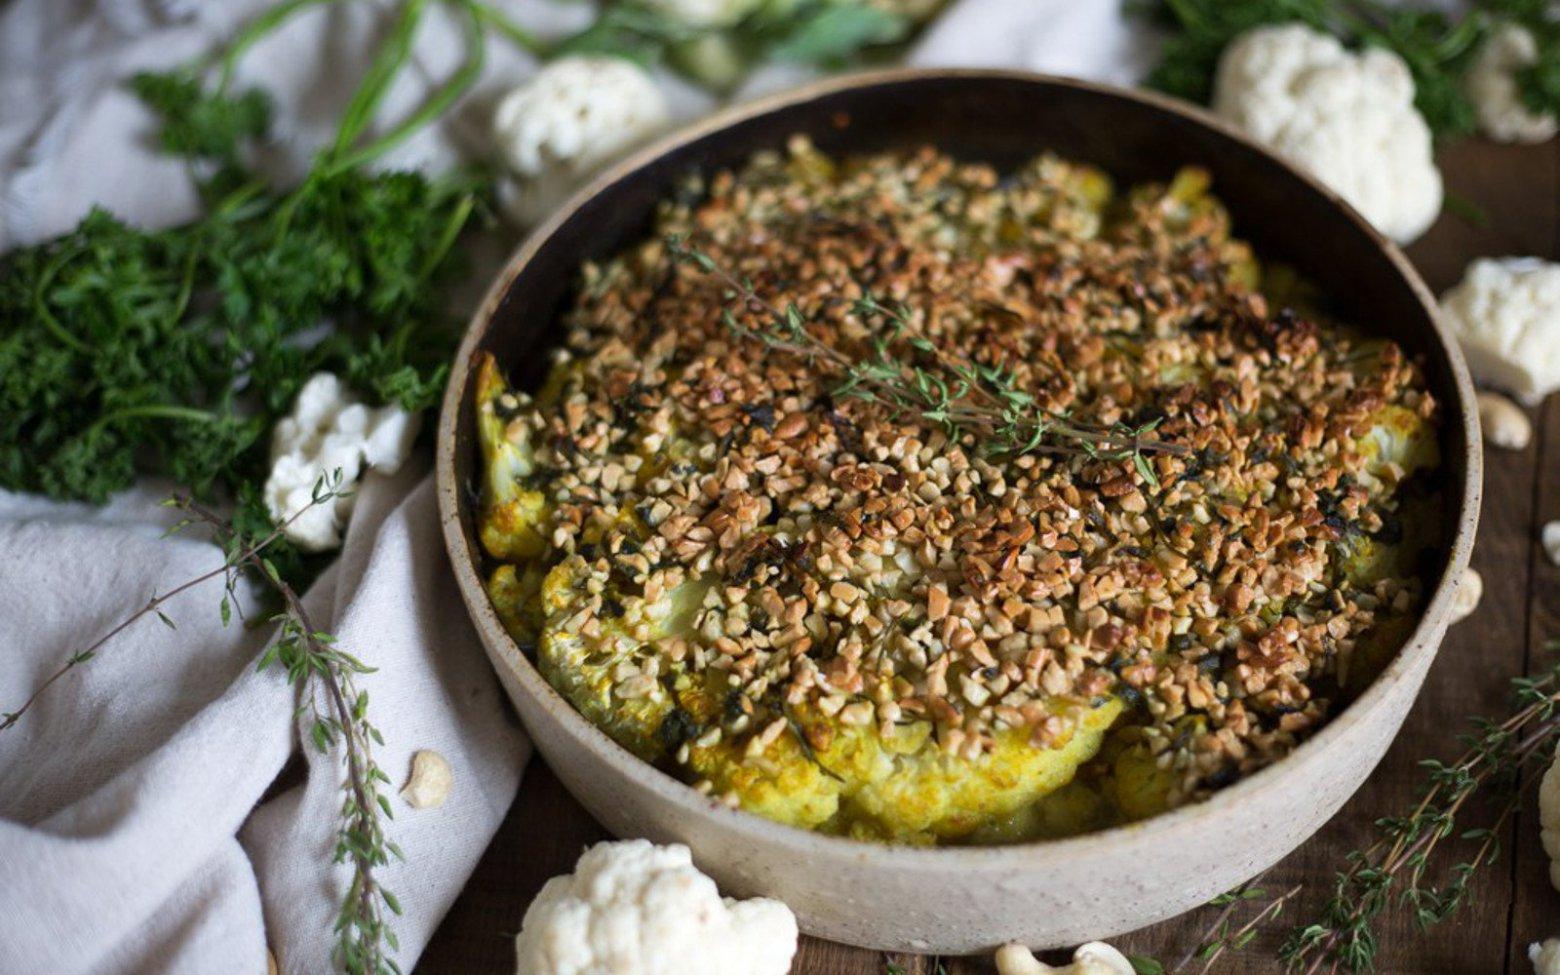 Vegan German Roasted Cauliflower With Curry Cashew Crust